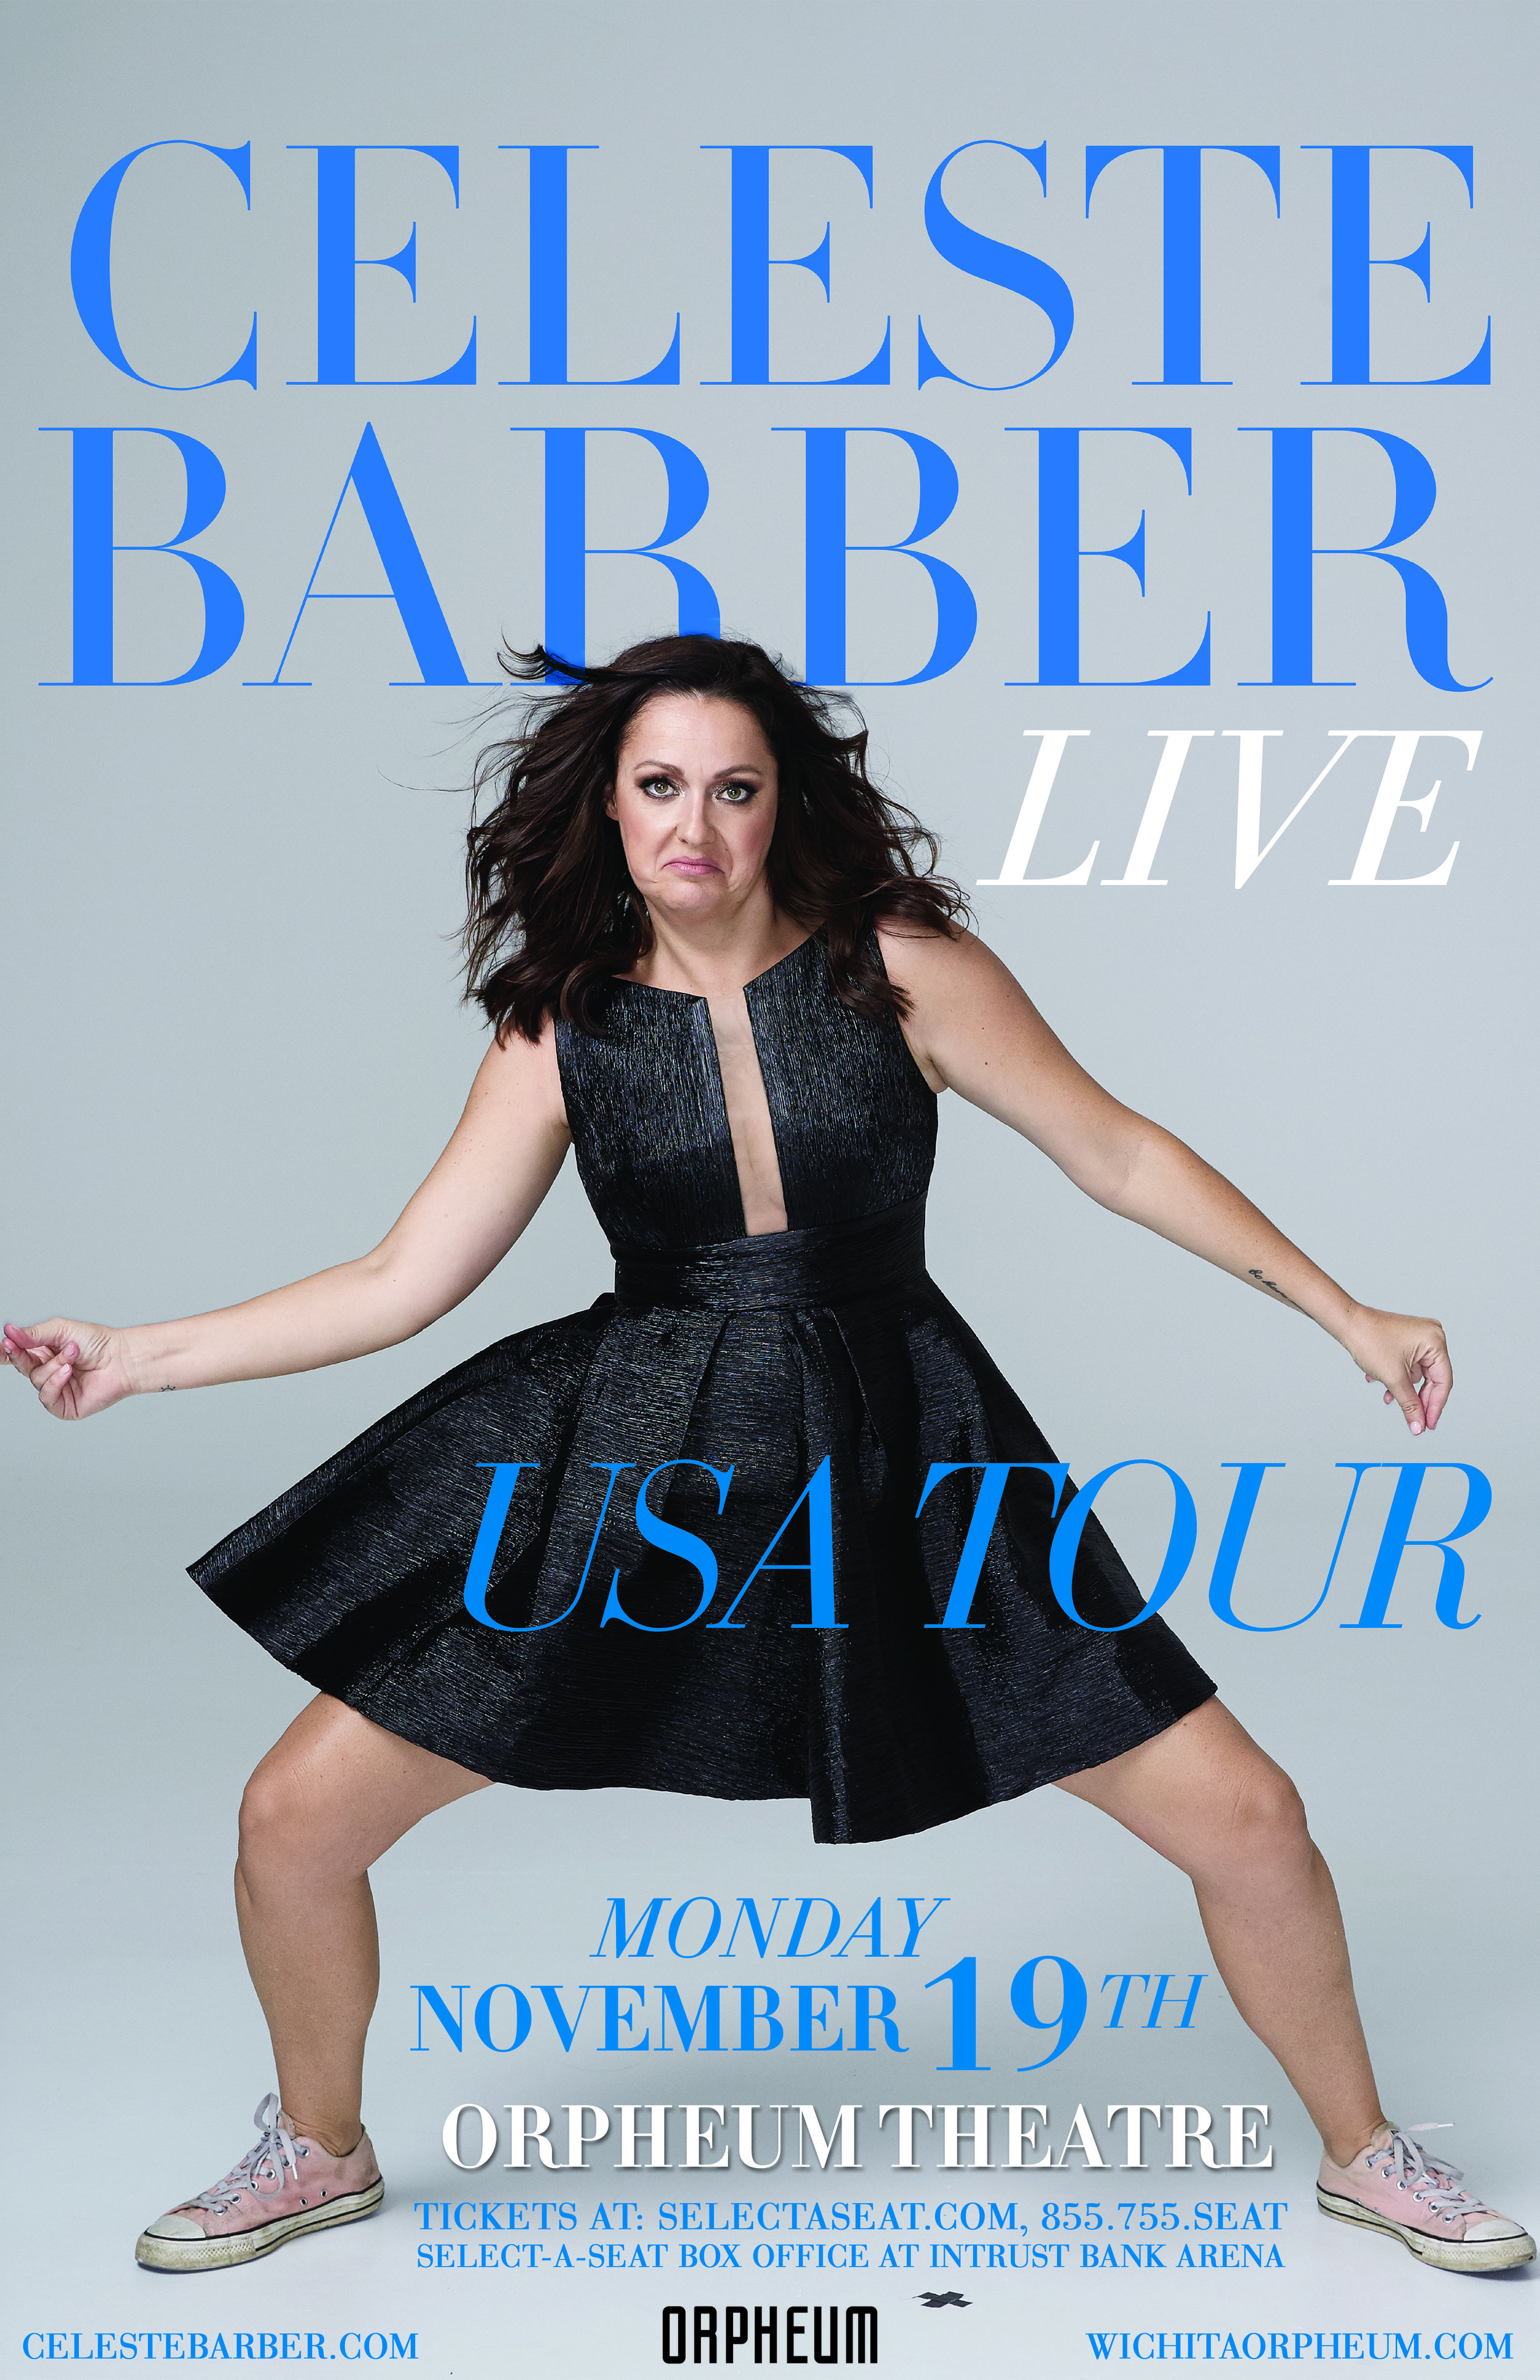 Celeste Barber Wichita Poster.jpg